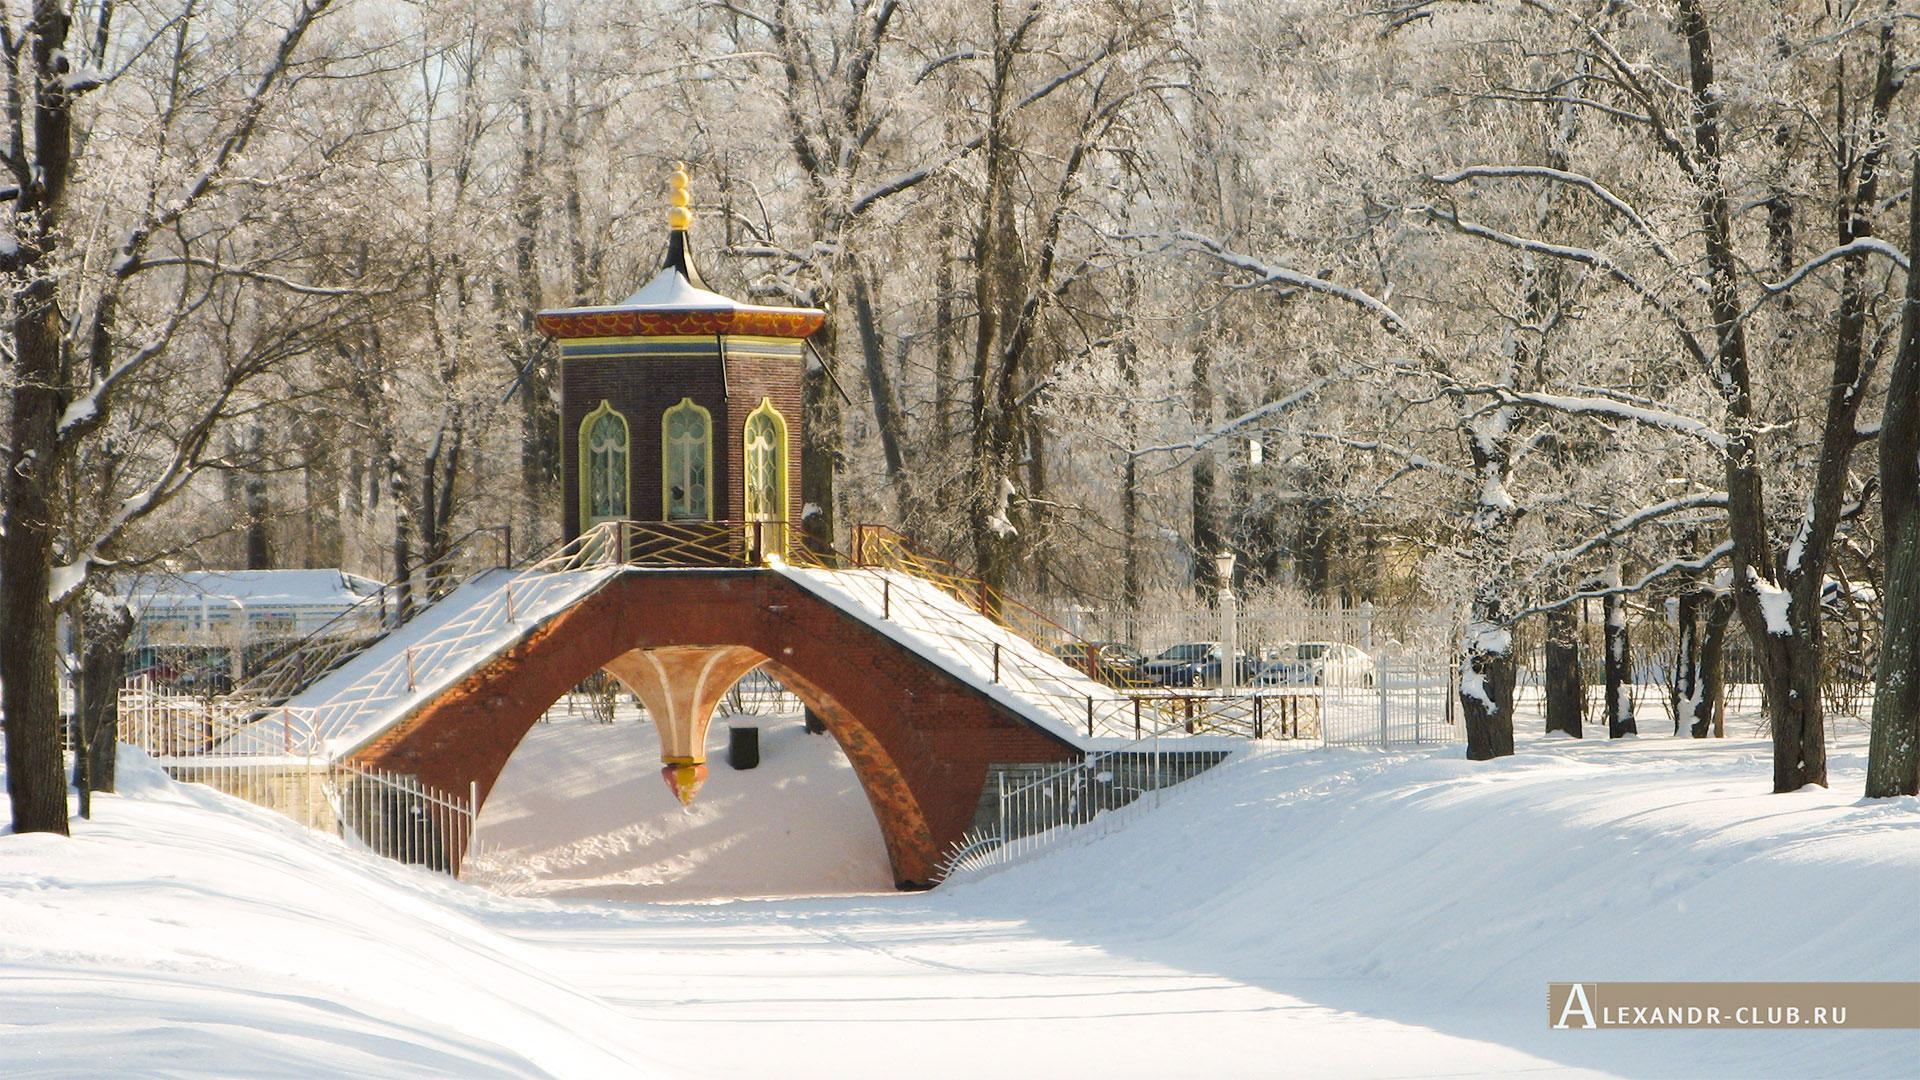 Пушкин, Царское Село, зима, Александровский парк, Крестовый мост